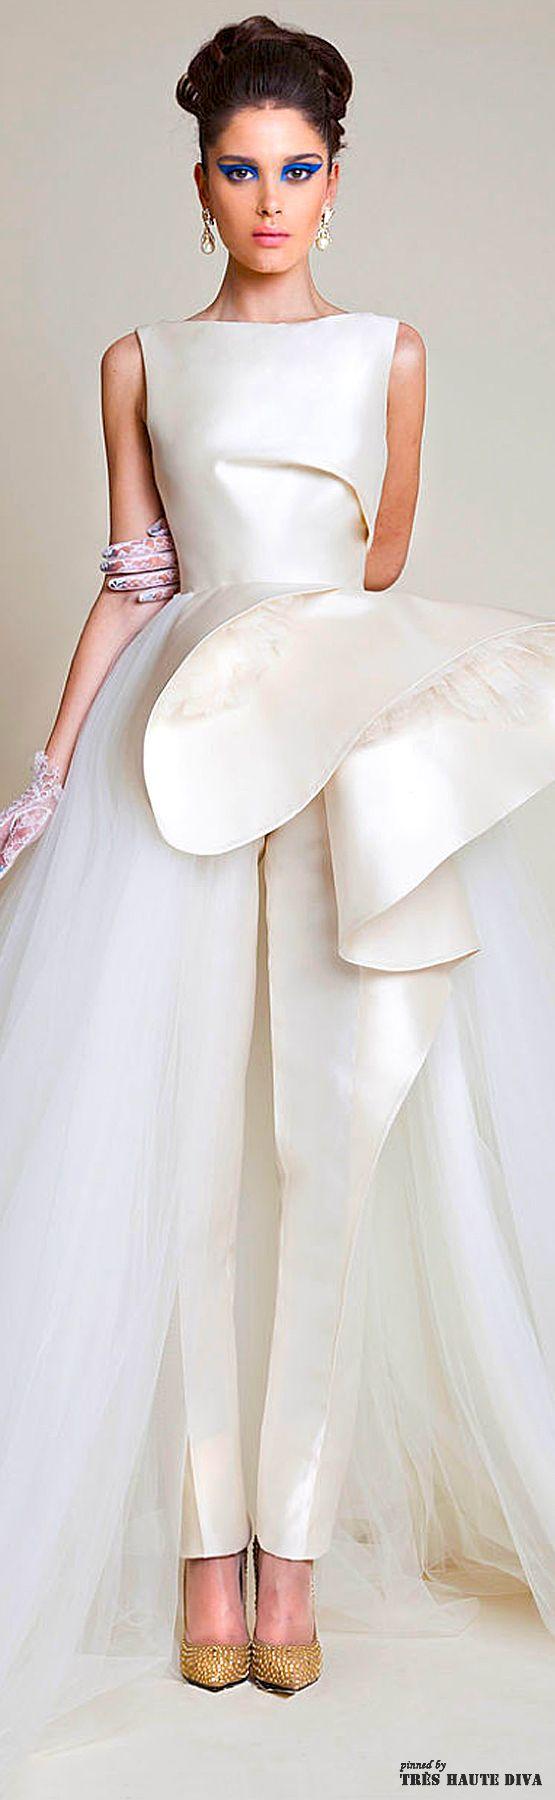 Galia lahav spring 2016 wedding dresses les r ves for Ivory wedding dress meaning